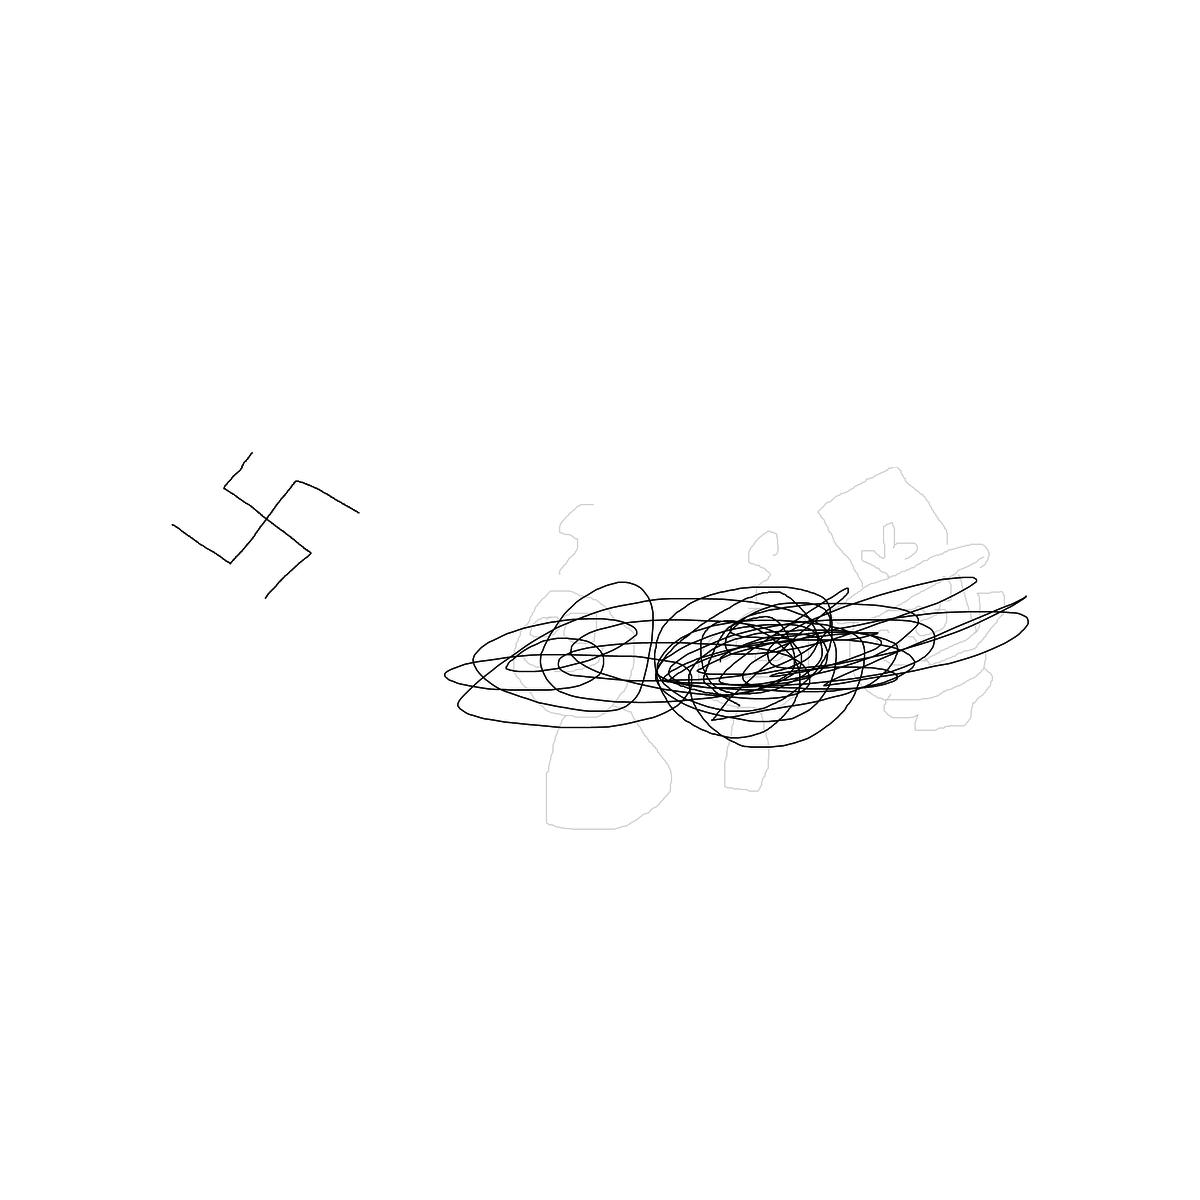 BAAAM drawing#23212 lat:78.4204483032226600lng: -4.4849925041198730